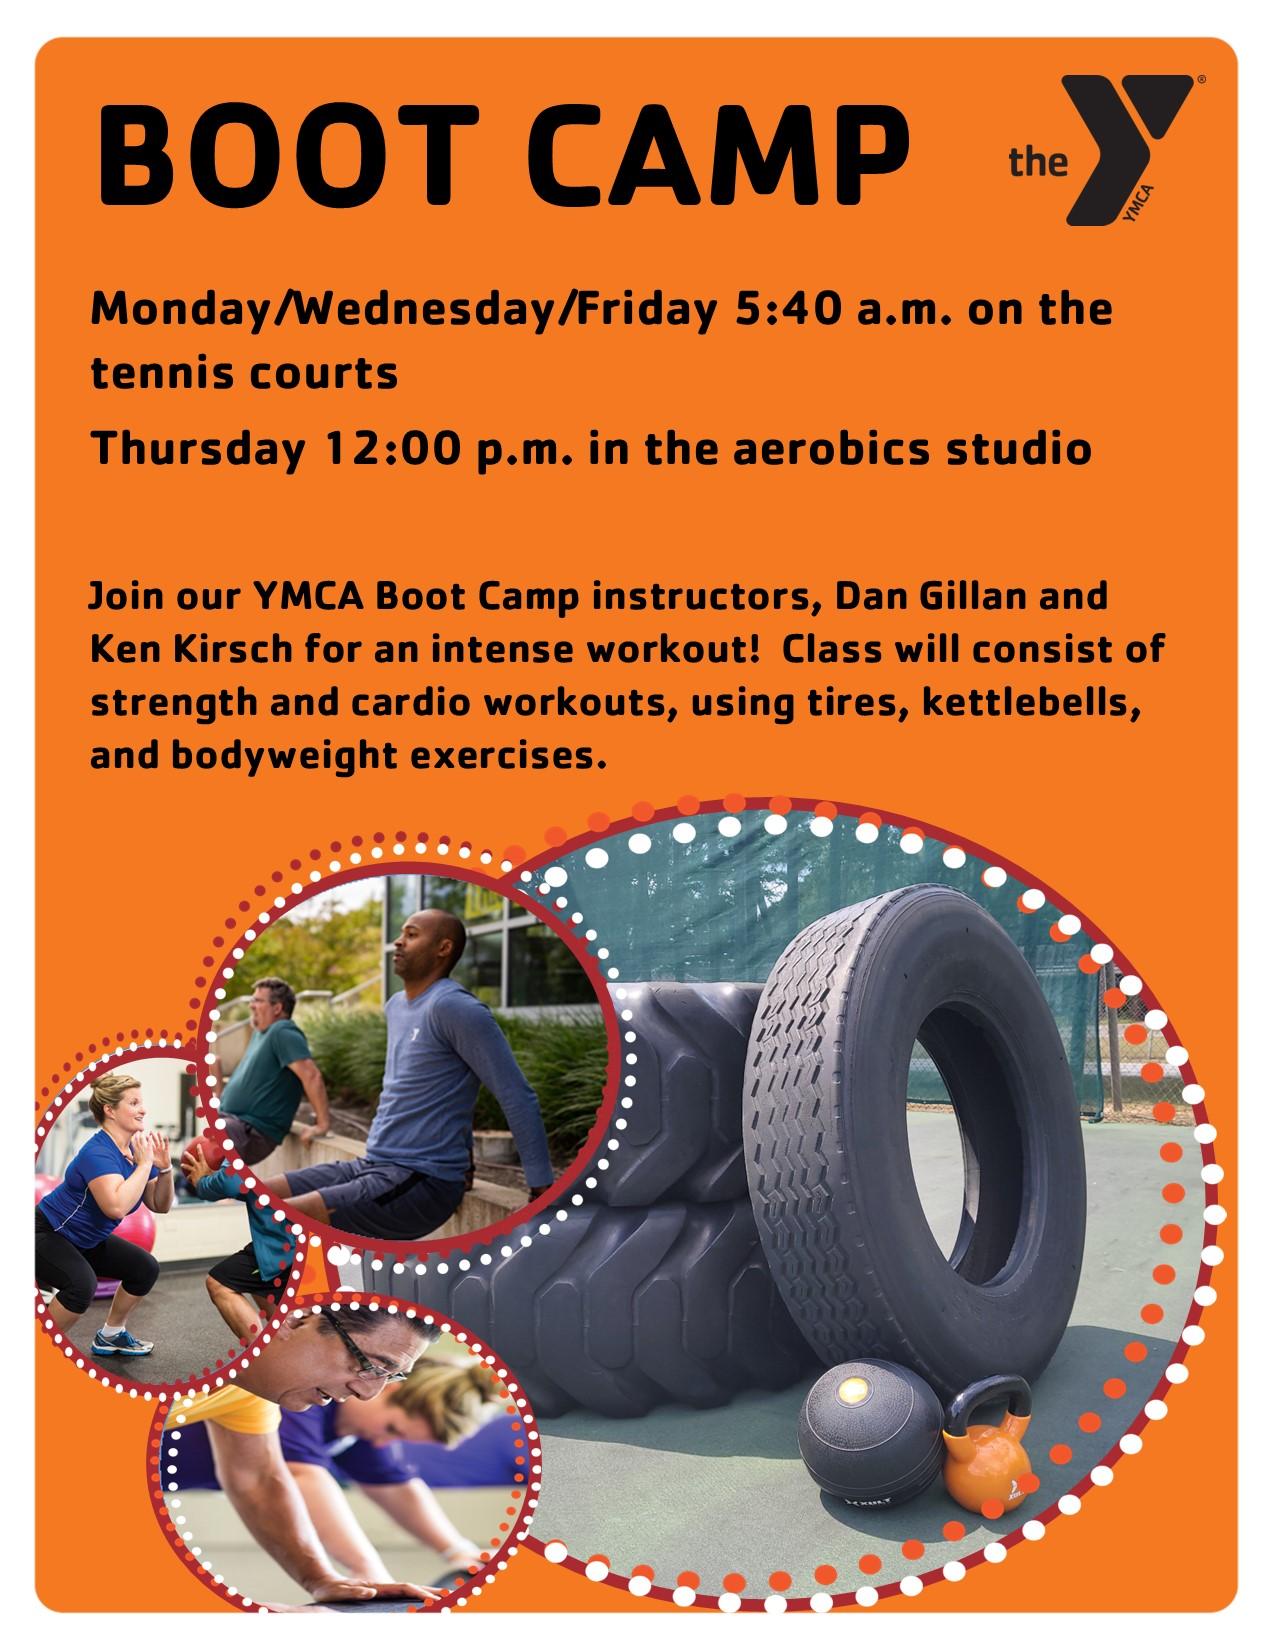 YMCA Boot Camp